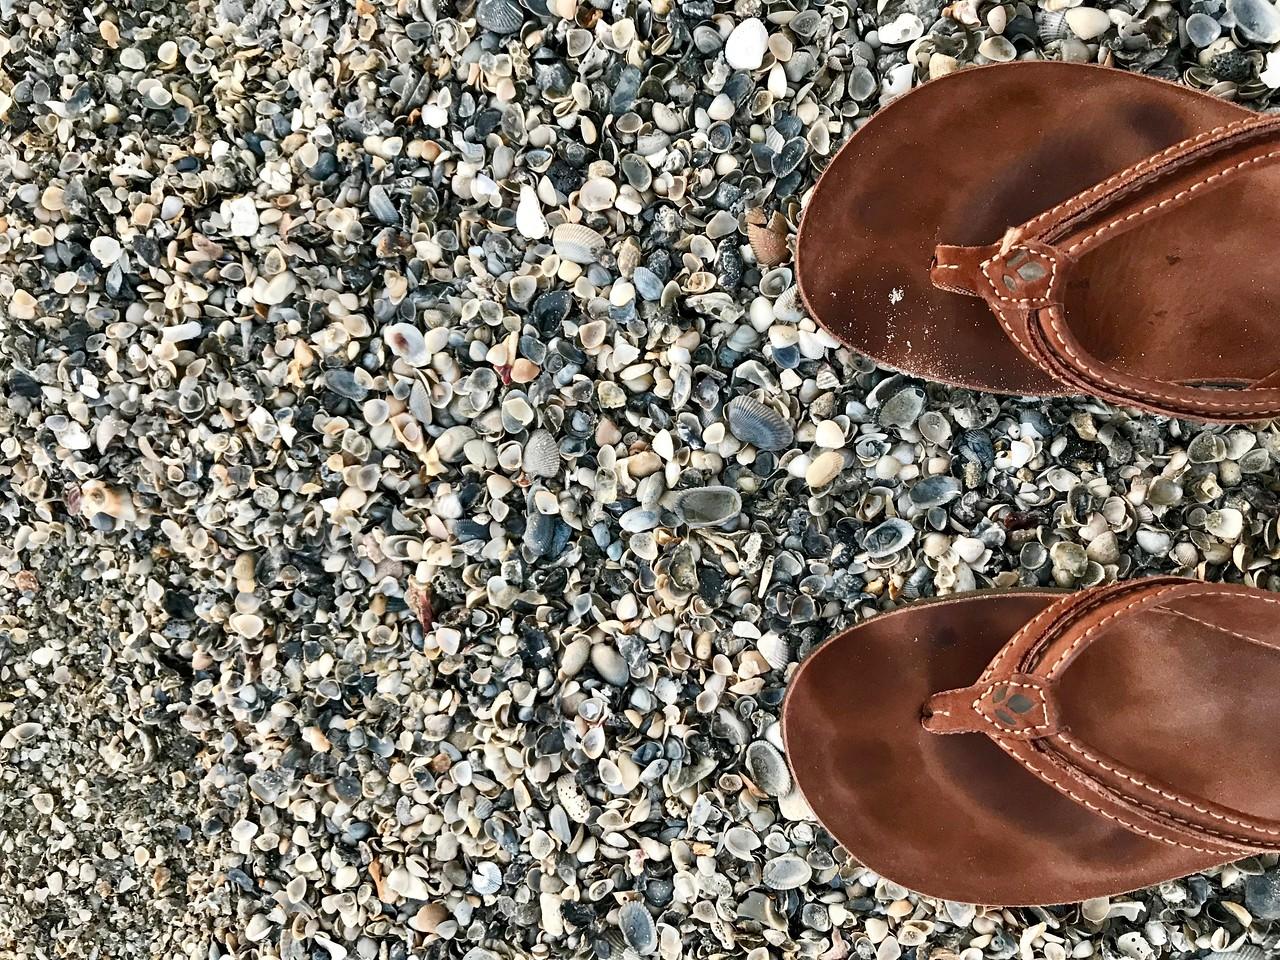 Flip flops on shells